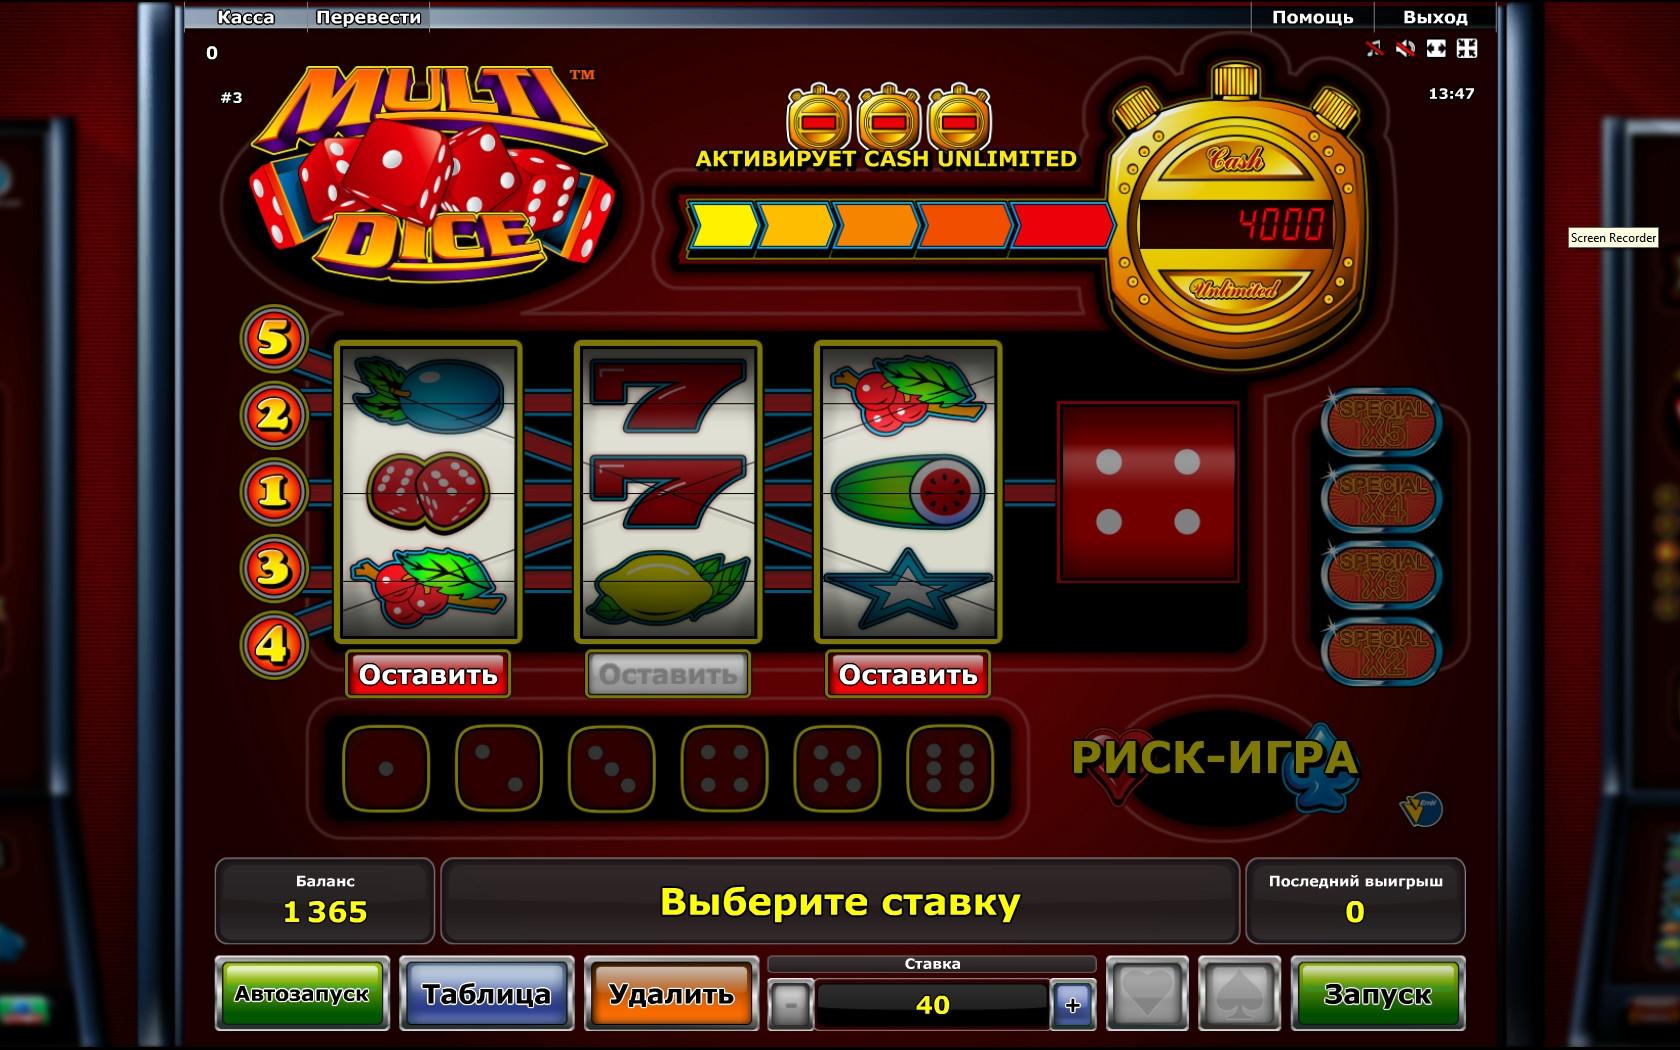 online slot machines casino games dice